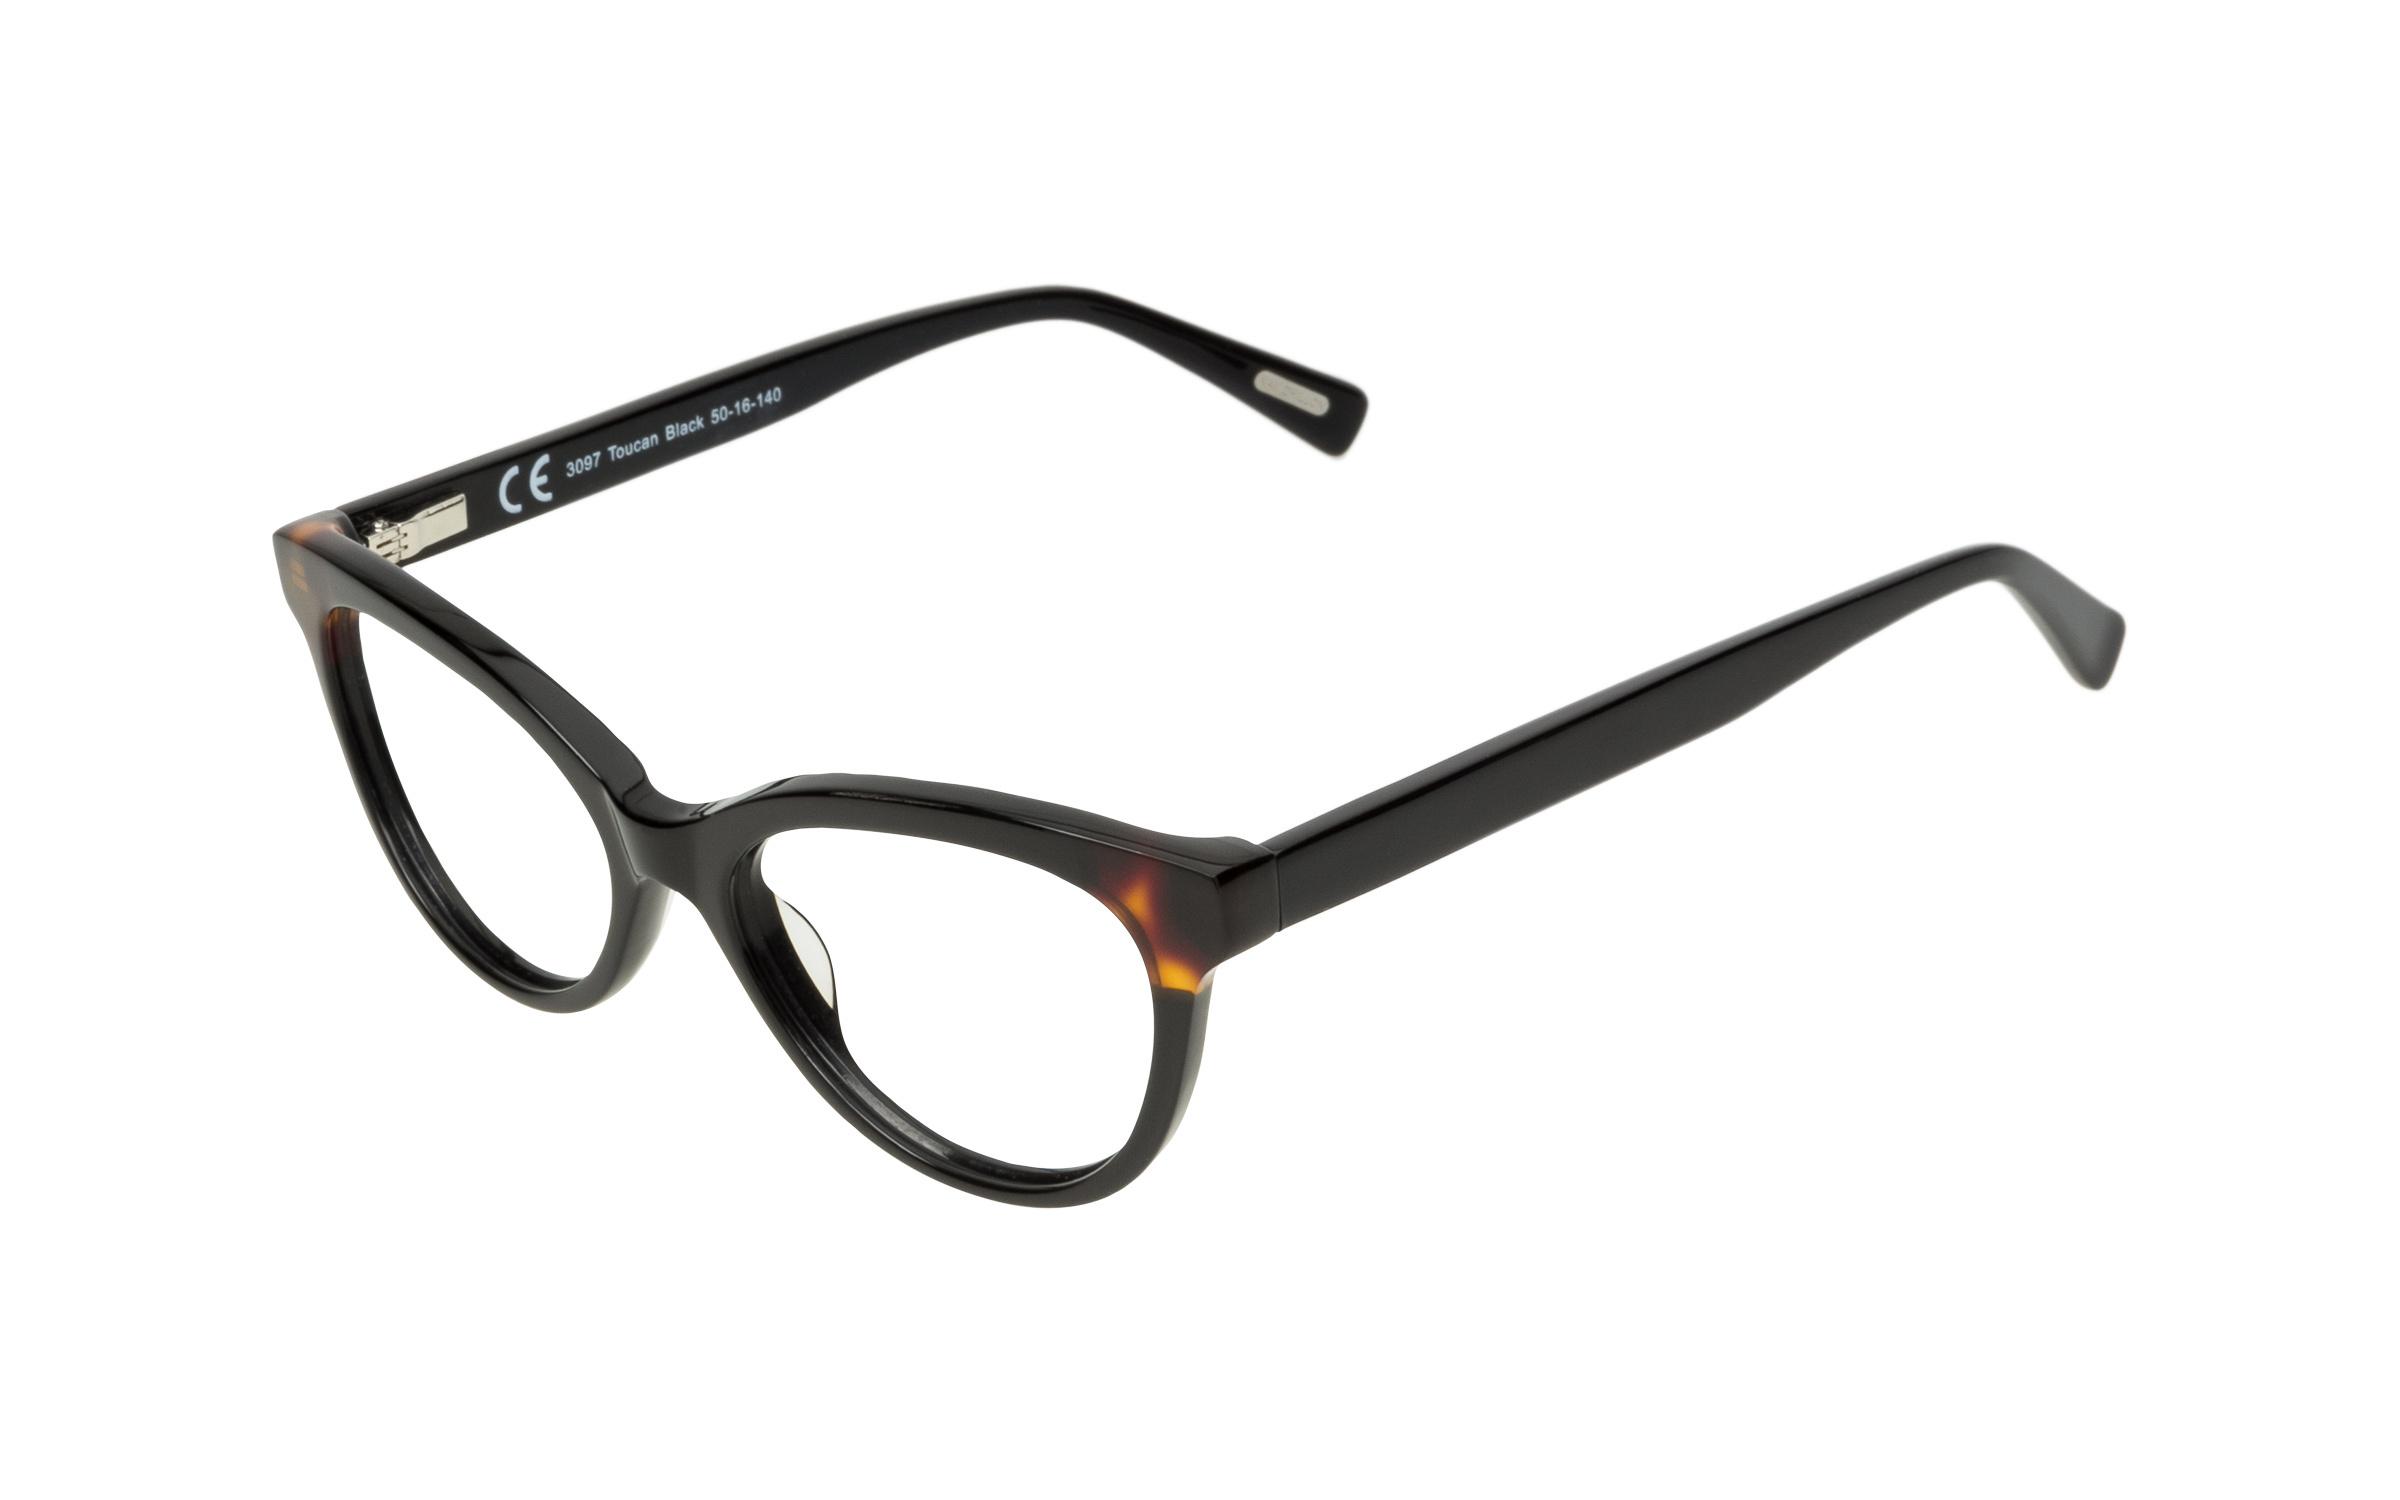 Women's Vintage Glasses Black Kam Dhillon Online Clearly